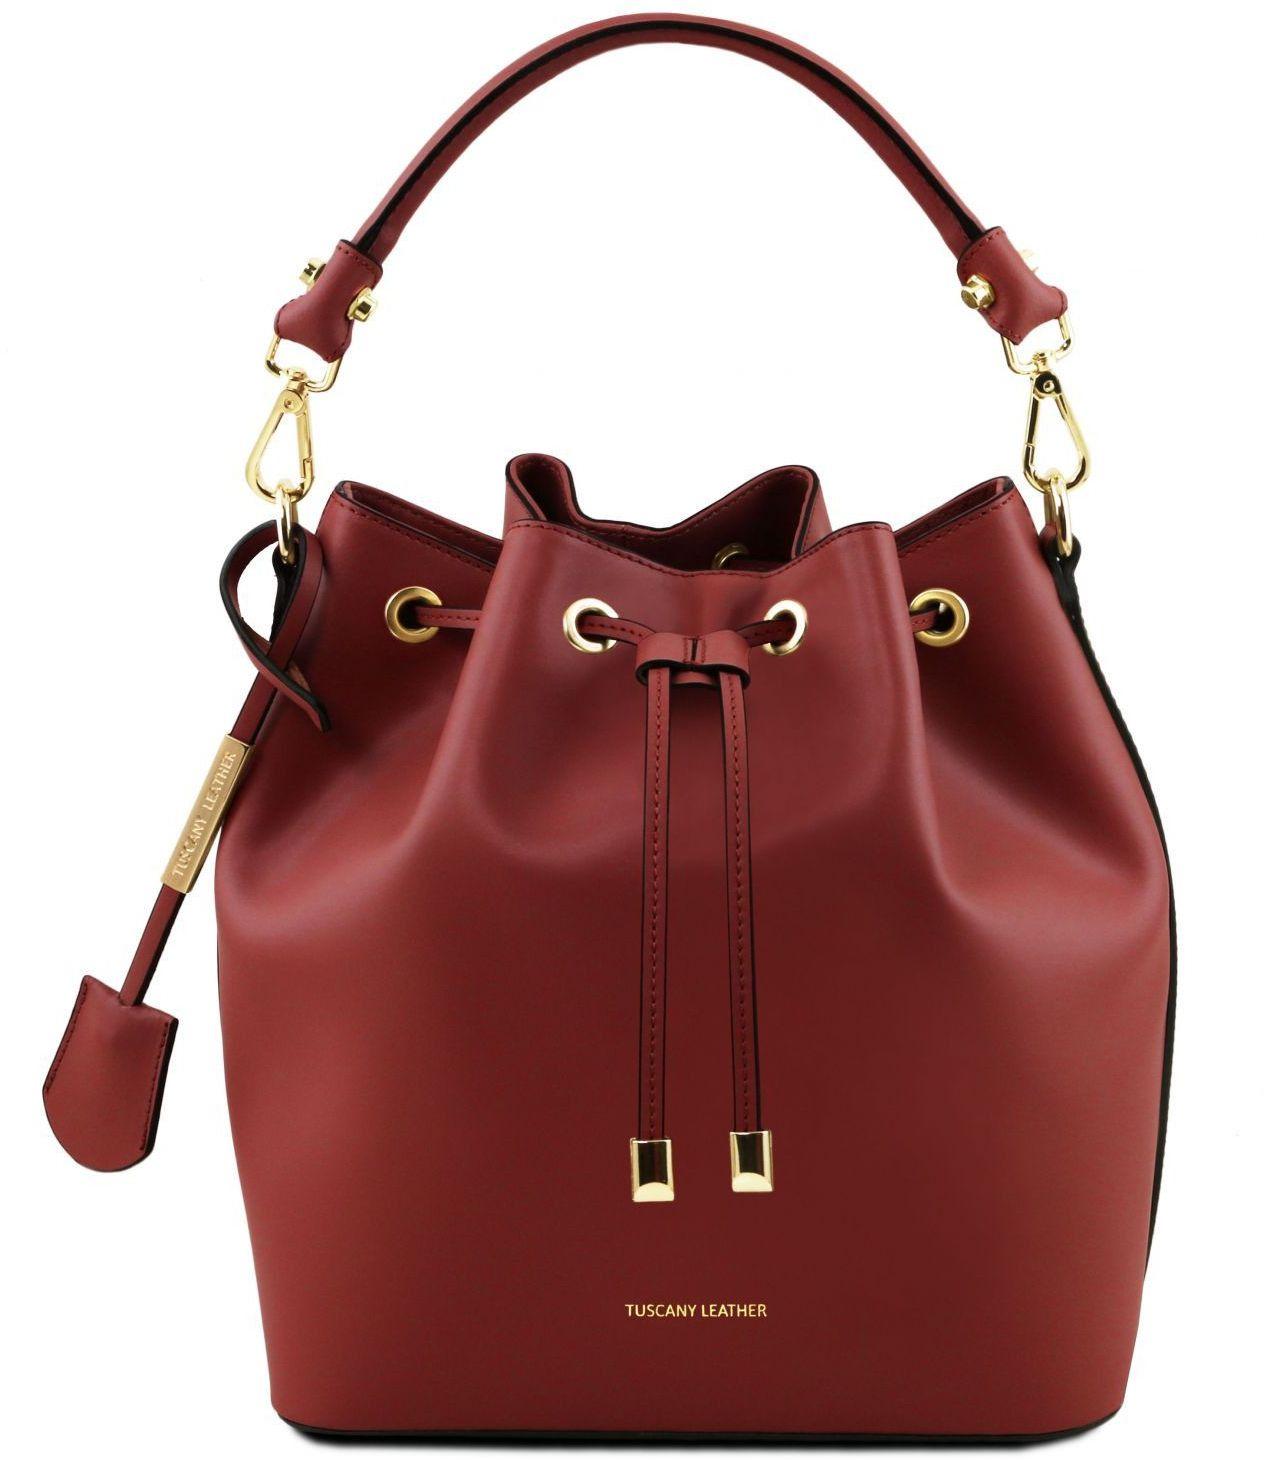 514c6bd60d Γυναικεία Τσάντα Δερμάτινη Vittoria Κόκκινο Tuscany Leather